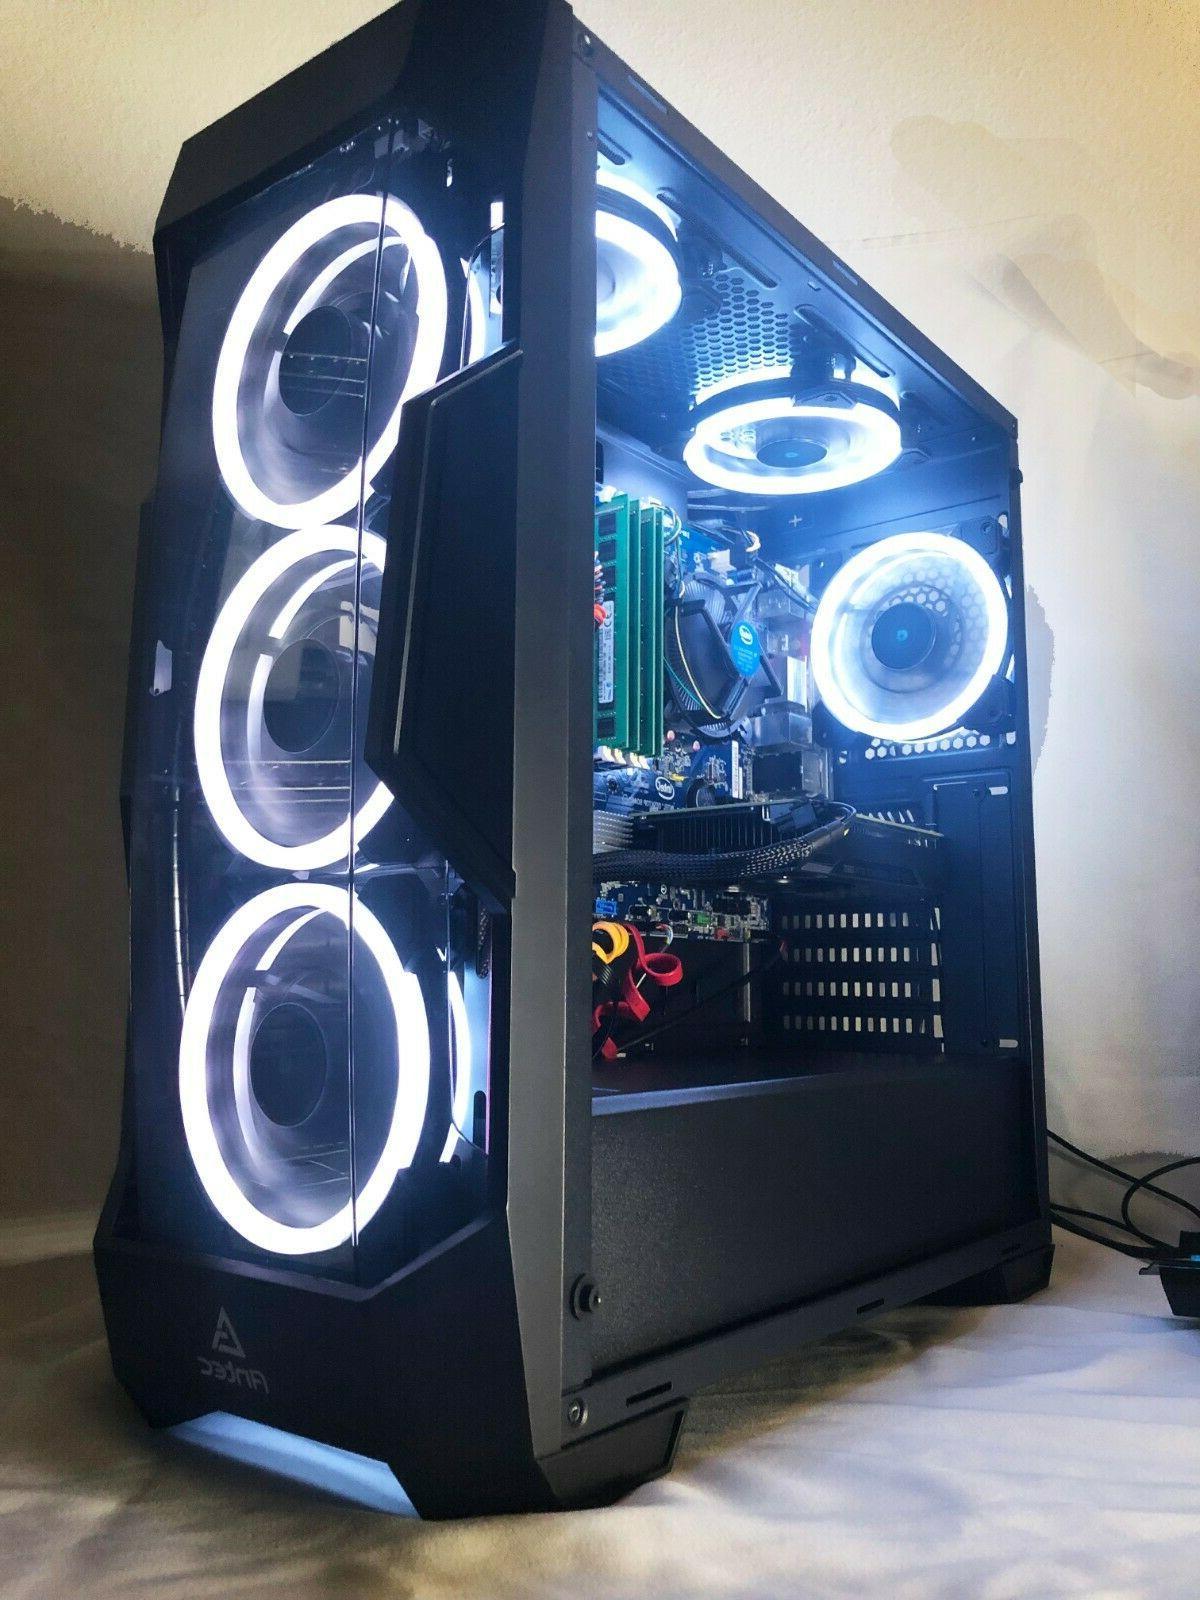 Gaming Computer i7-3.40GHz,120GB SSD,16GB,2TB,Nvidia GTX1060,WiFi,Win10